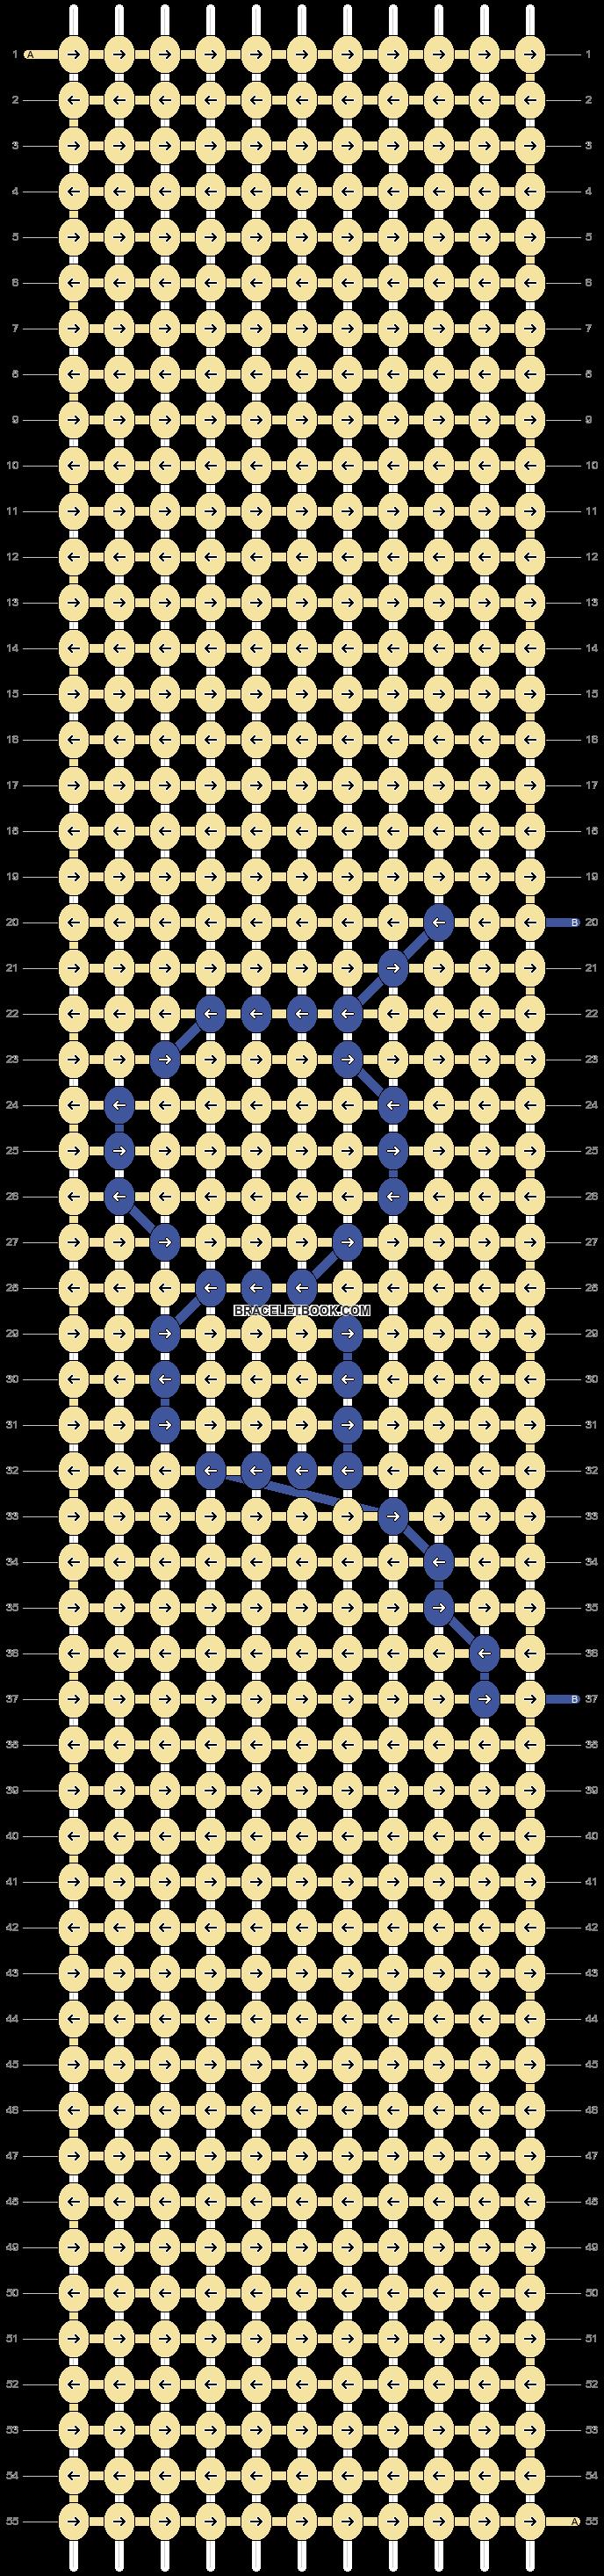 Alpha pattern #46134 pattern